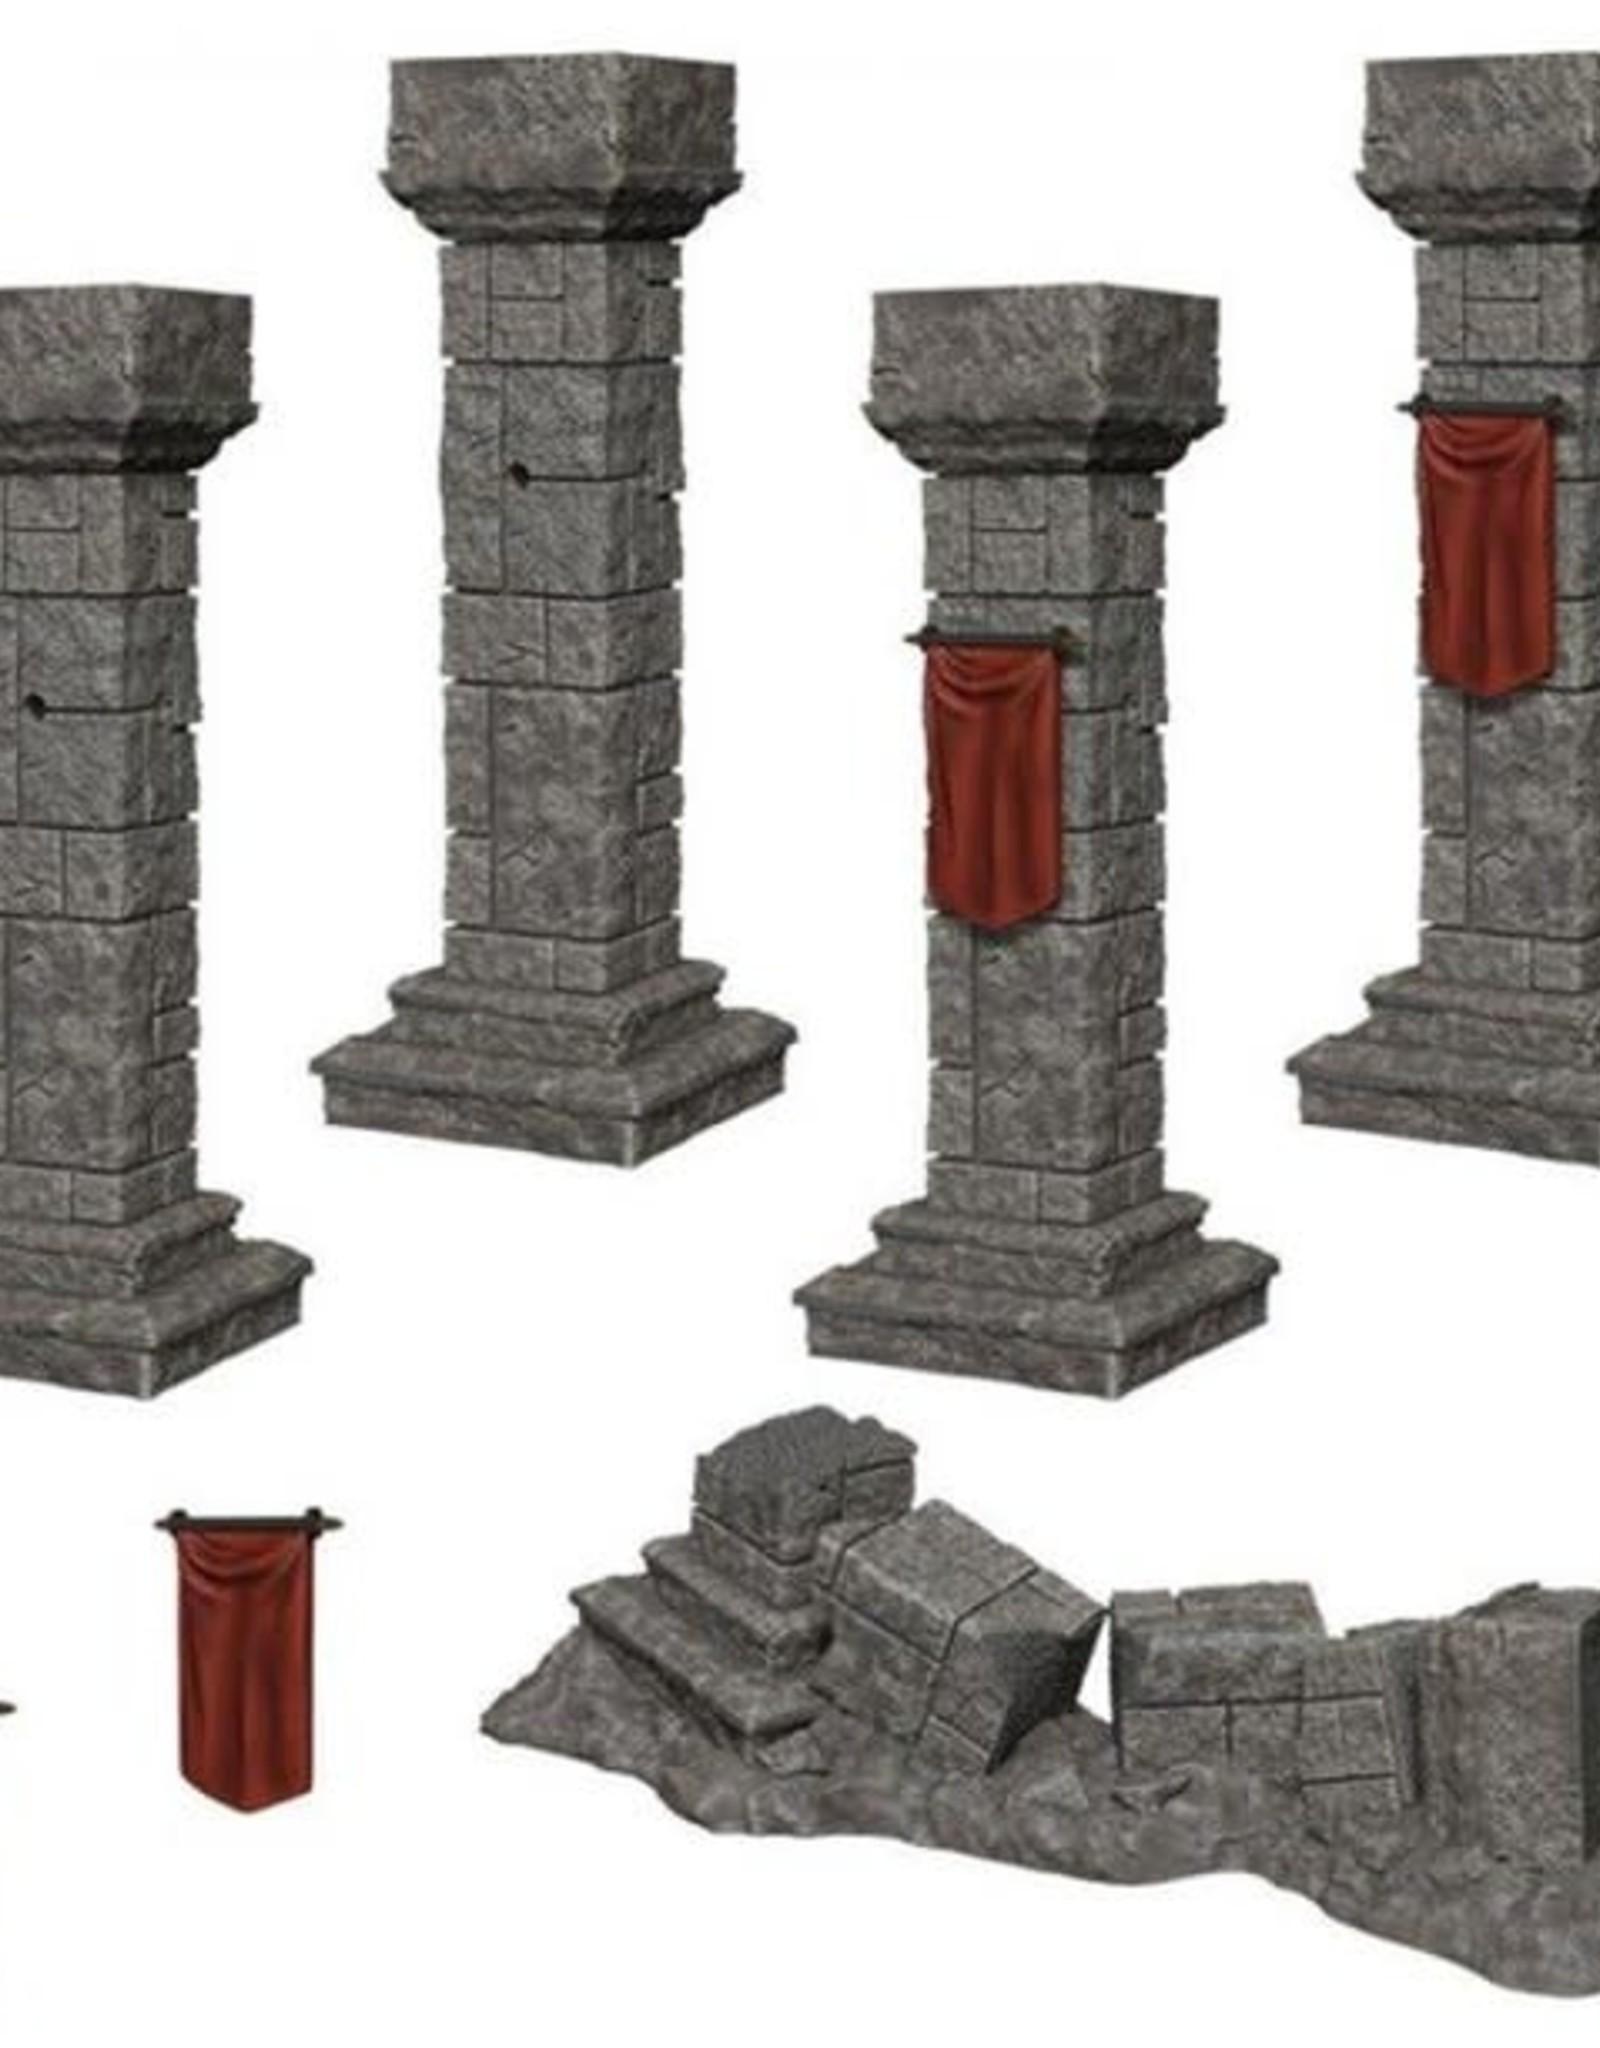 Nolzur's Marvelous Miniatures D&D D&D NMU - Pillars & Banners